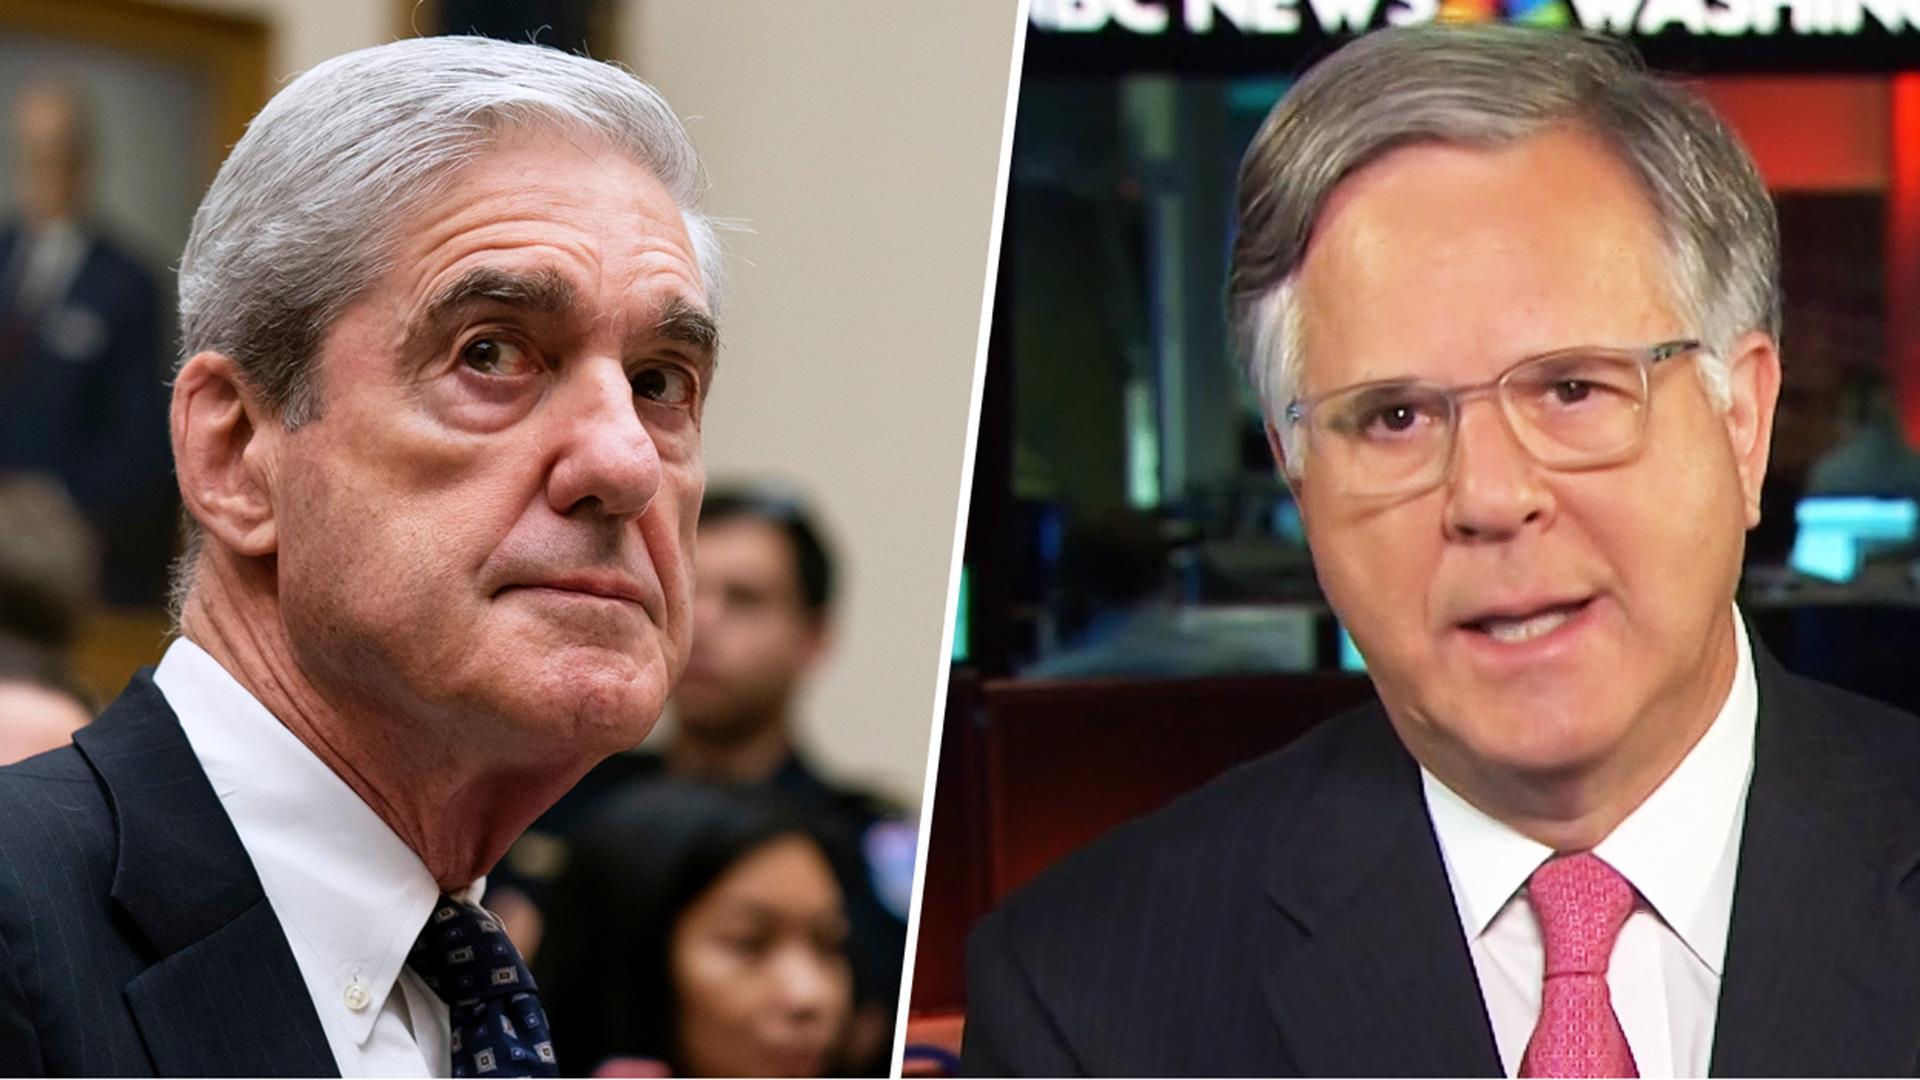 Pete Williams reviews Robert Mueller's hearing appearance so far